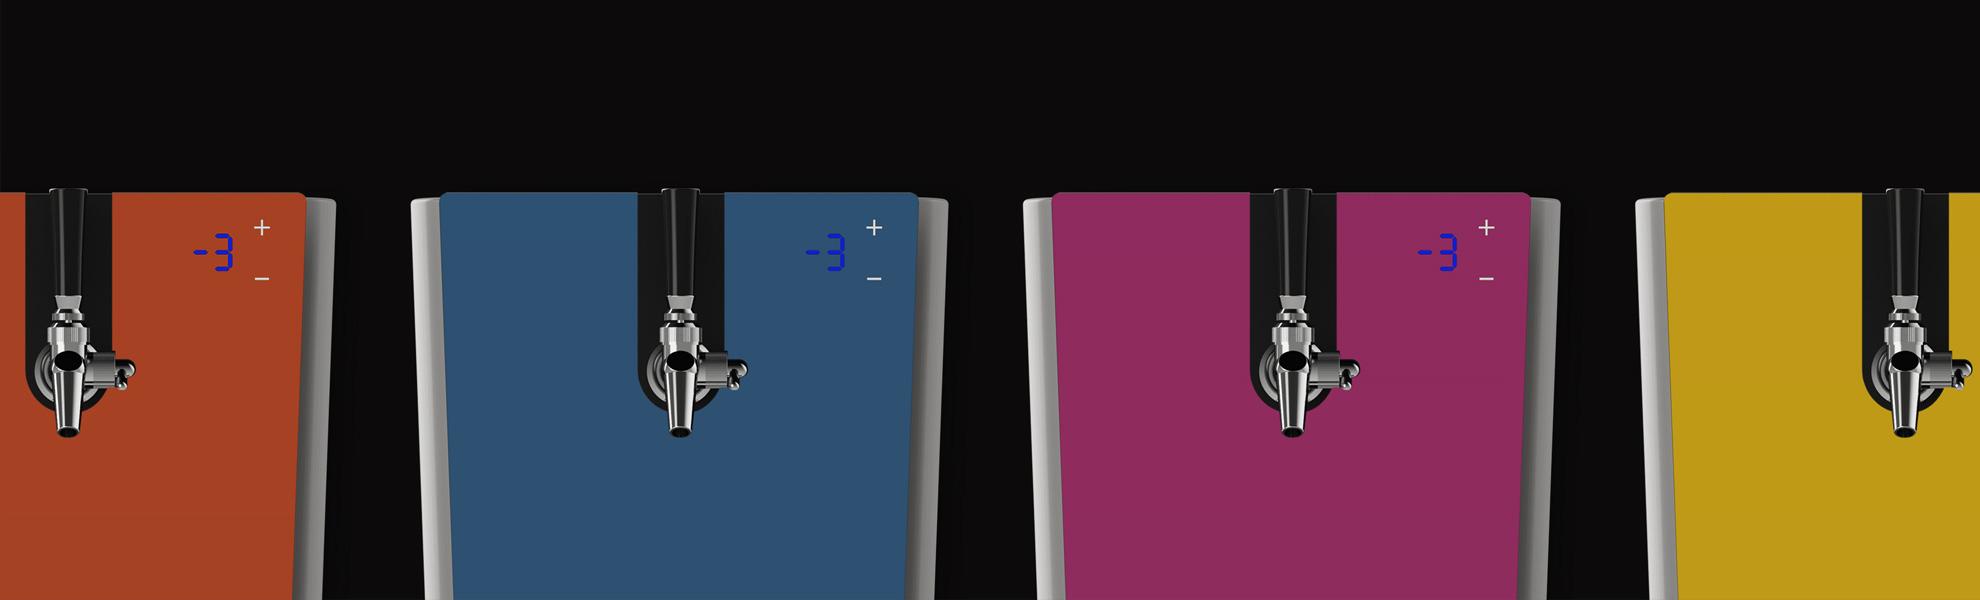 chelles-e-hayashi-design-portfolio-embraco-growler-draft-beer-dispenser-product